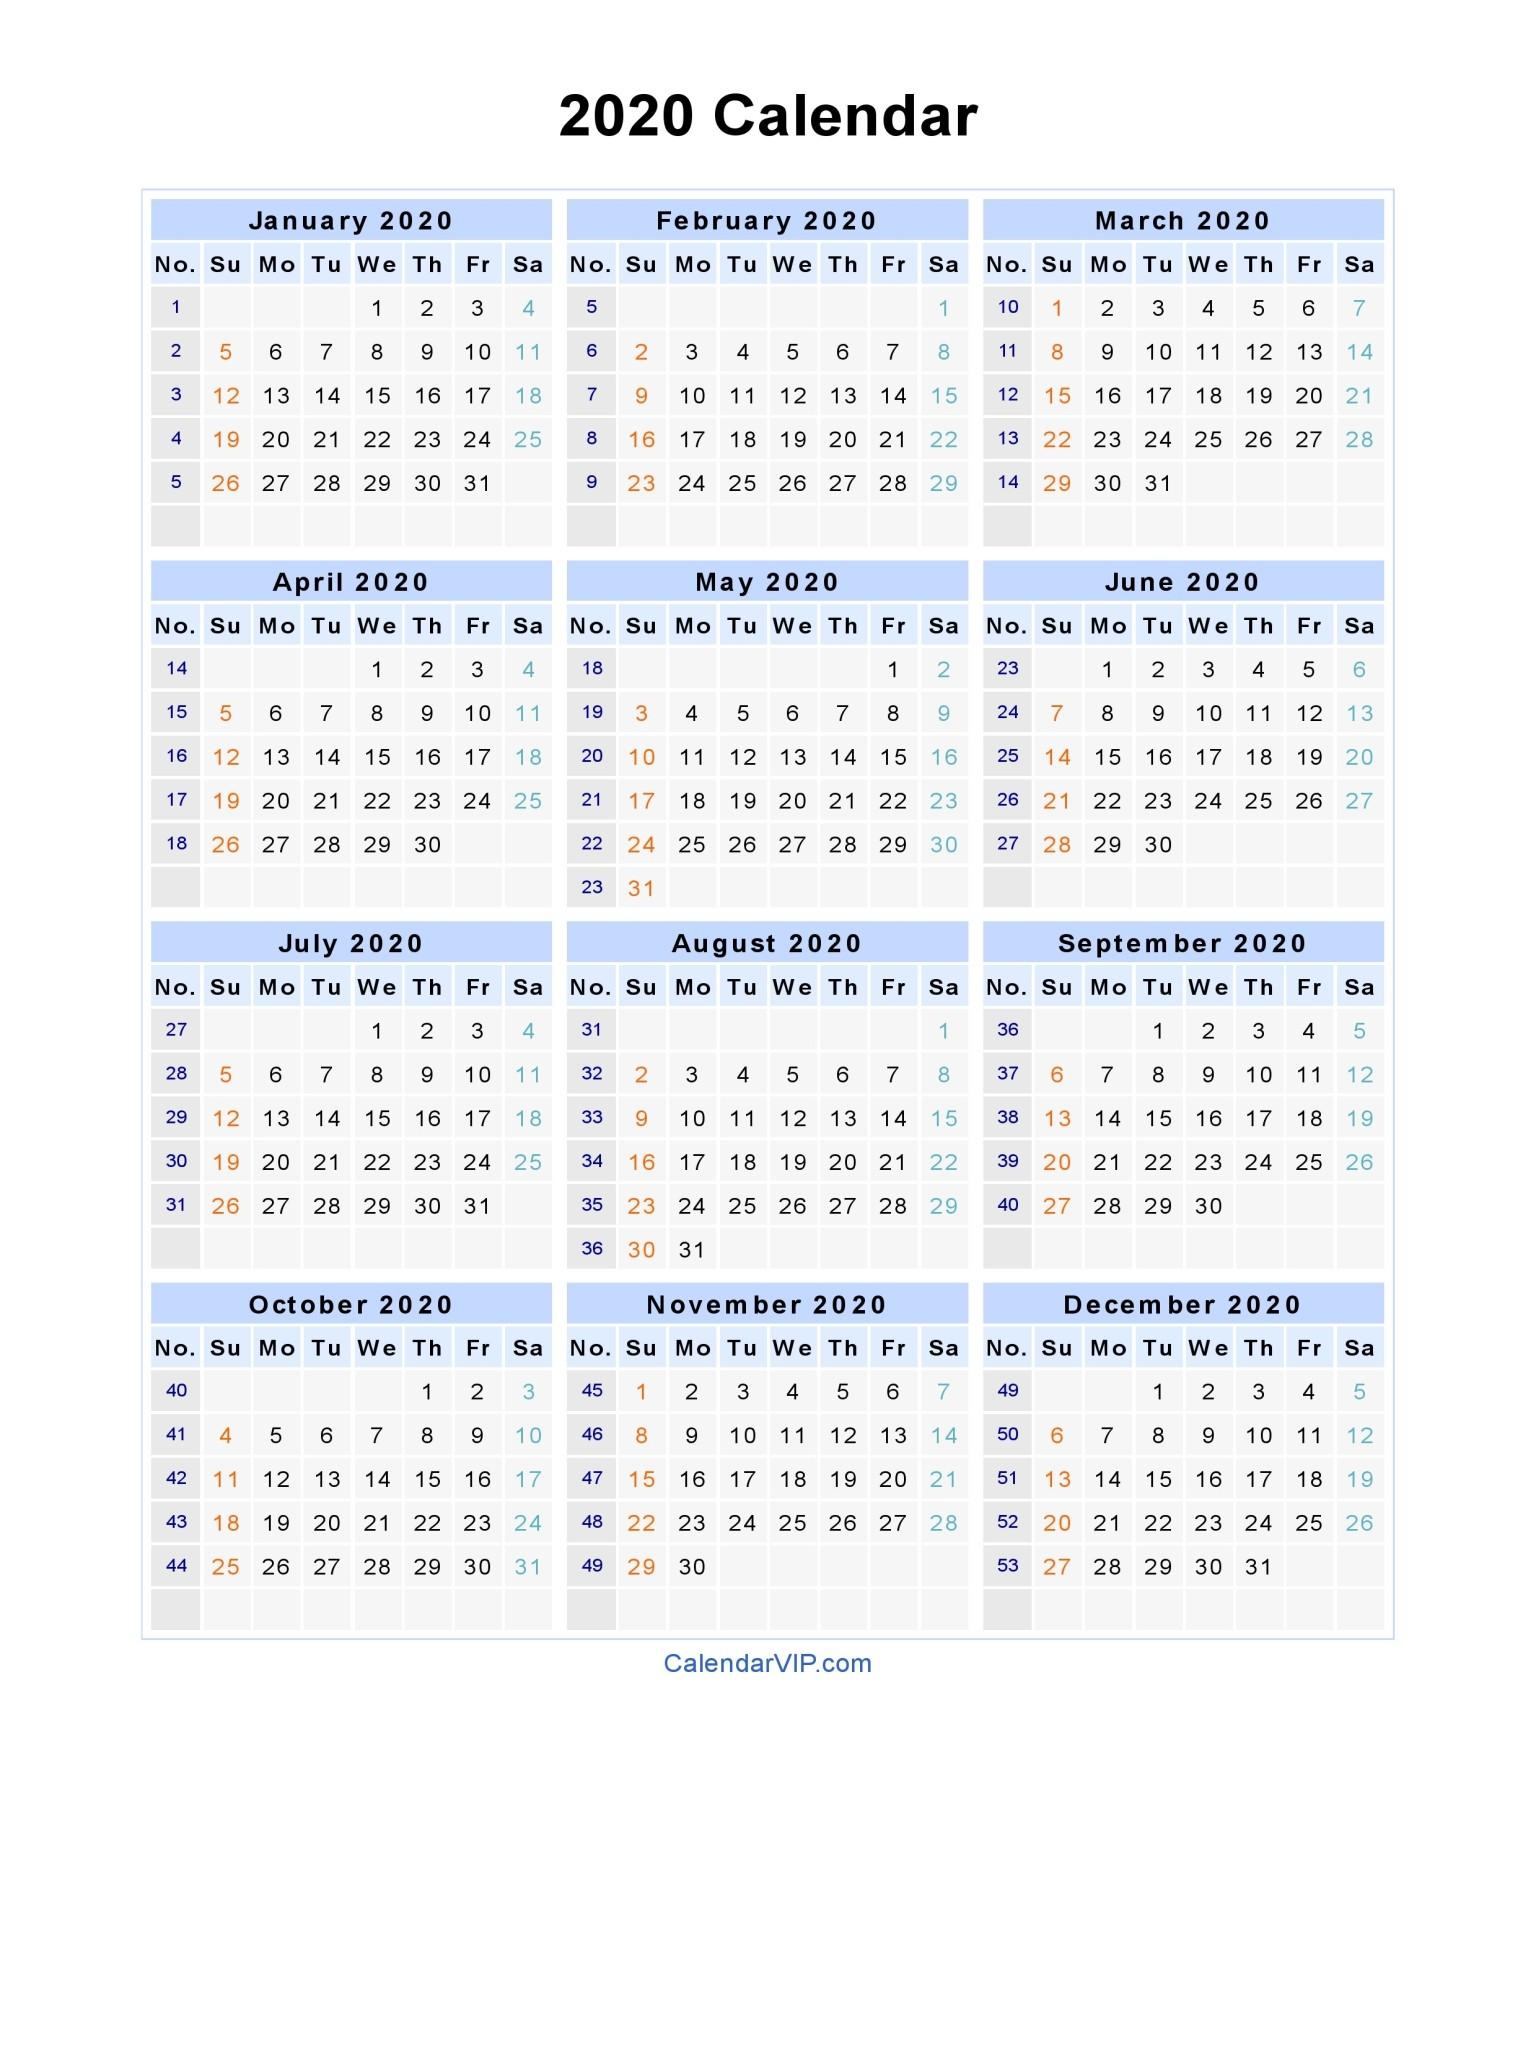 2020 Calendar Blank Printable Calendar Template in PDF